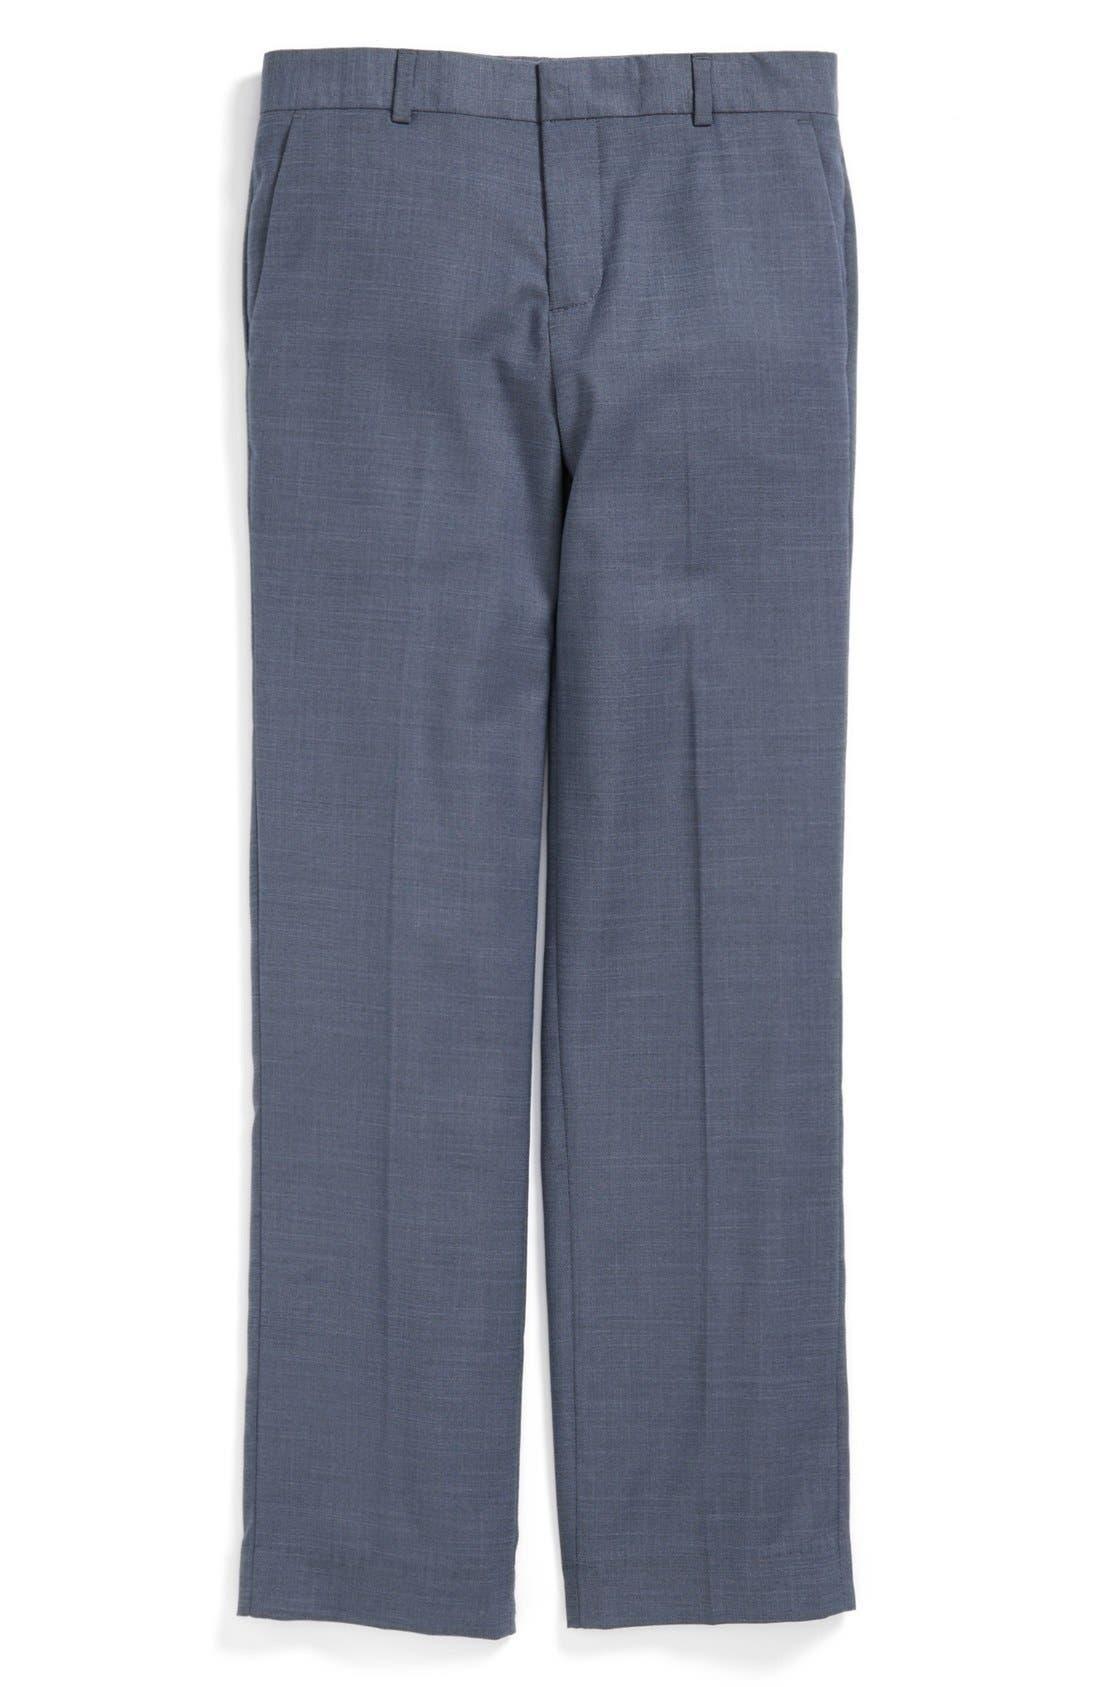 Main Image - C2 by Calibrate 'Sterling' Dress Pants (Big Boys)